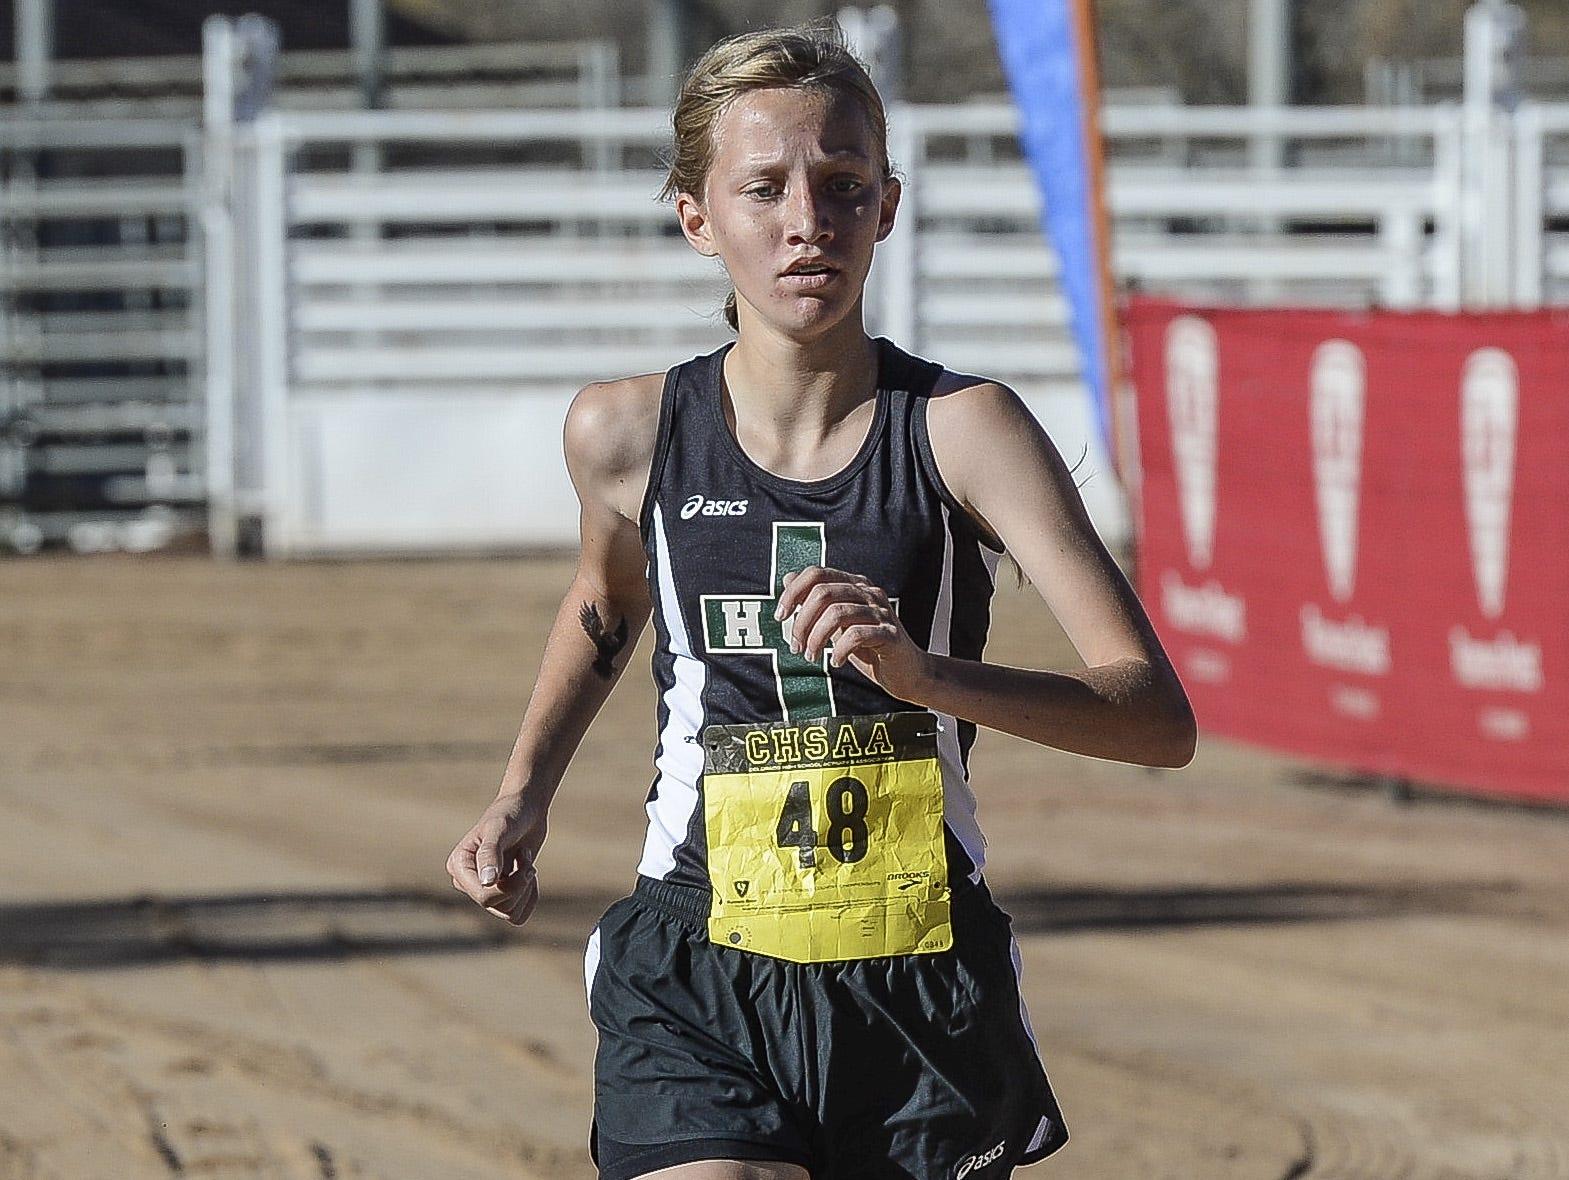 Heritage Christian Academy's Rachel Rairdon has been named the Coloradoan's Female Athlete of the Week.